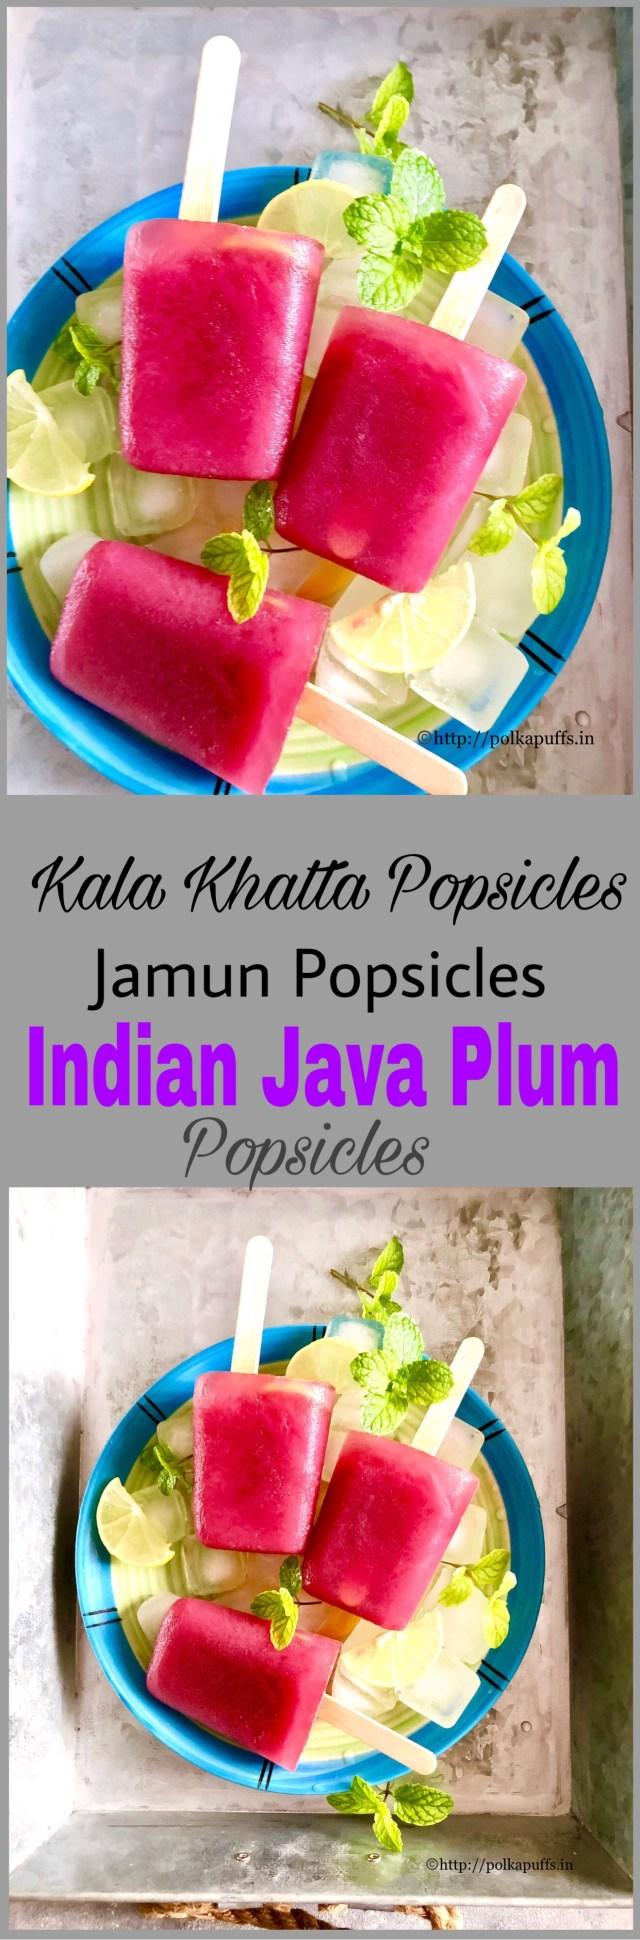 Kala Khatta Popsicles   Jamun Popsicles   Indian Java Plum Popsicles